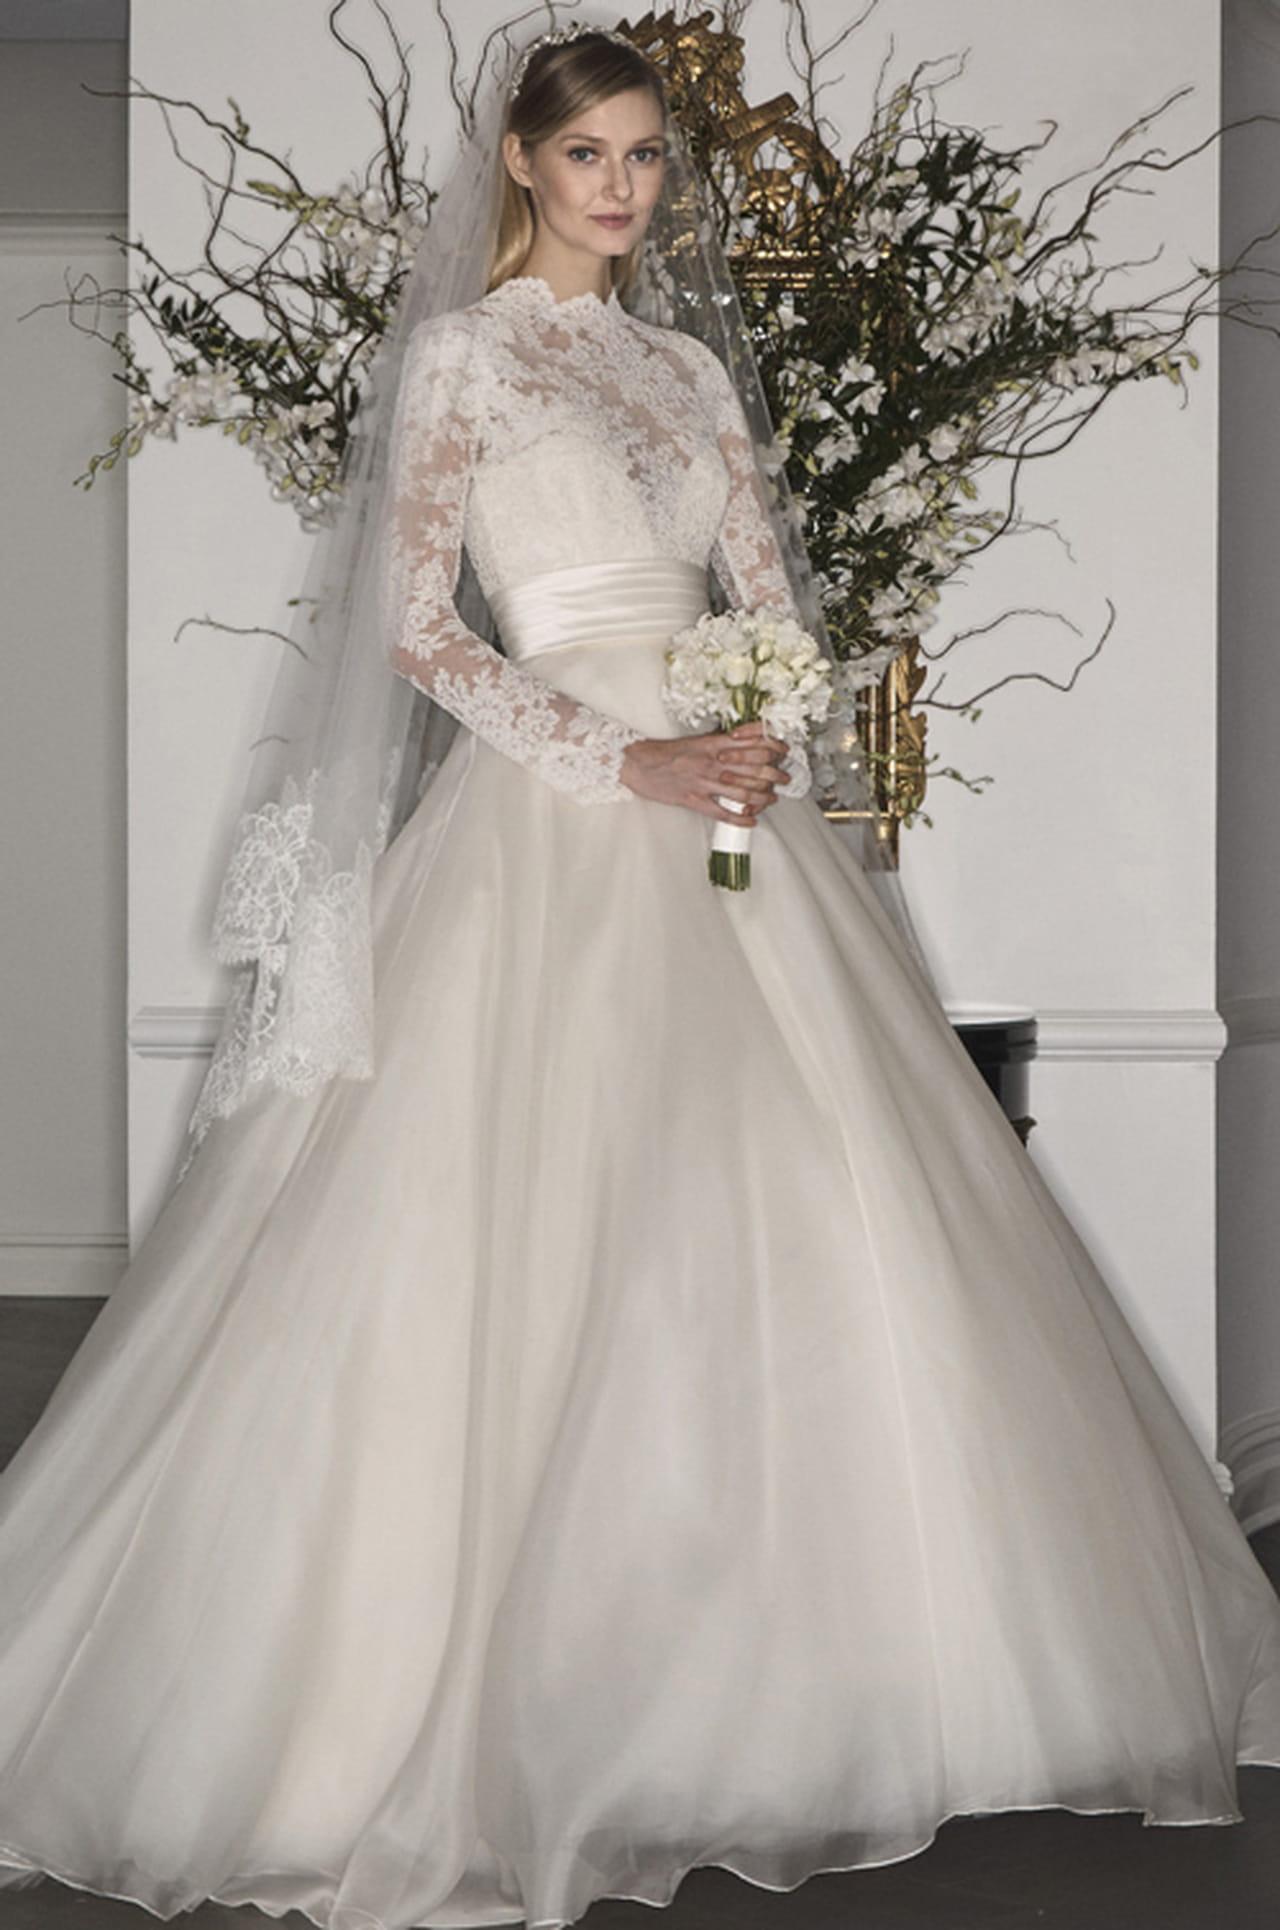 bf0ce1416 فستان زفاف بأكمام طويلة وتصميم محتشم من Romona Keveza.